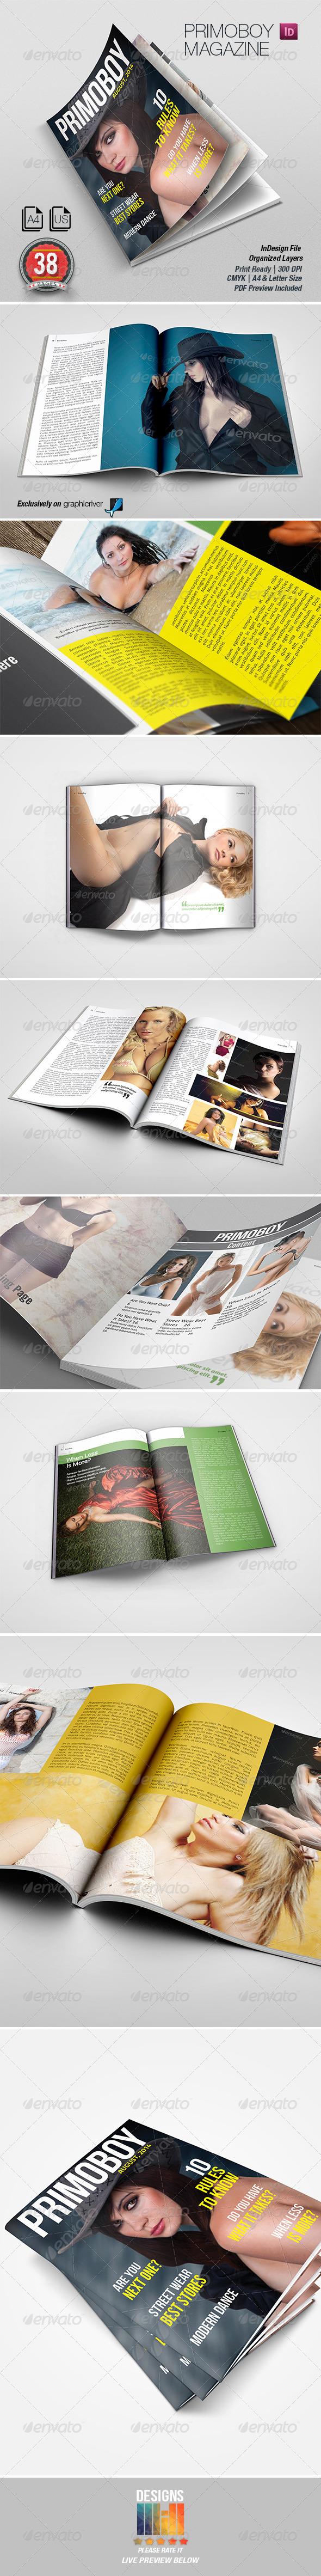 Primoboy Magazine - Magazines Print Templates